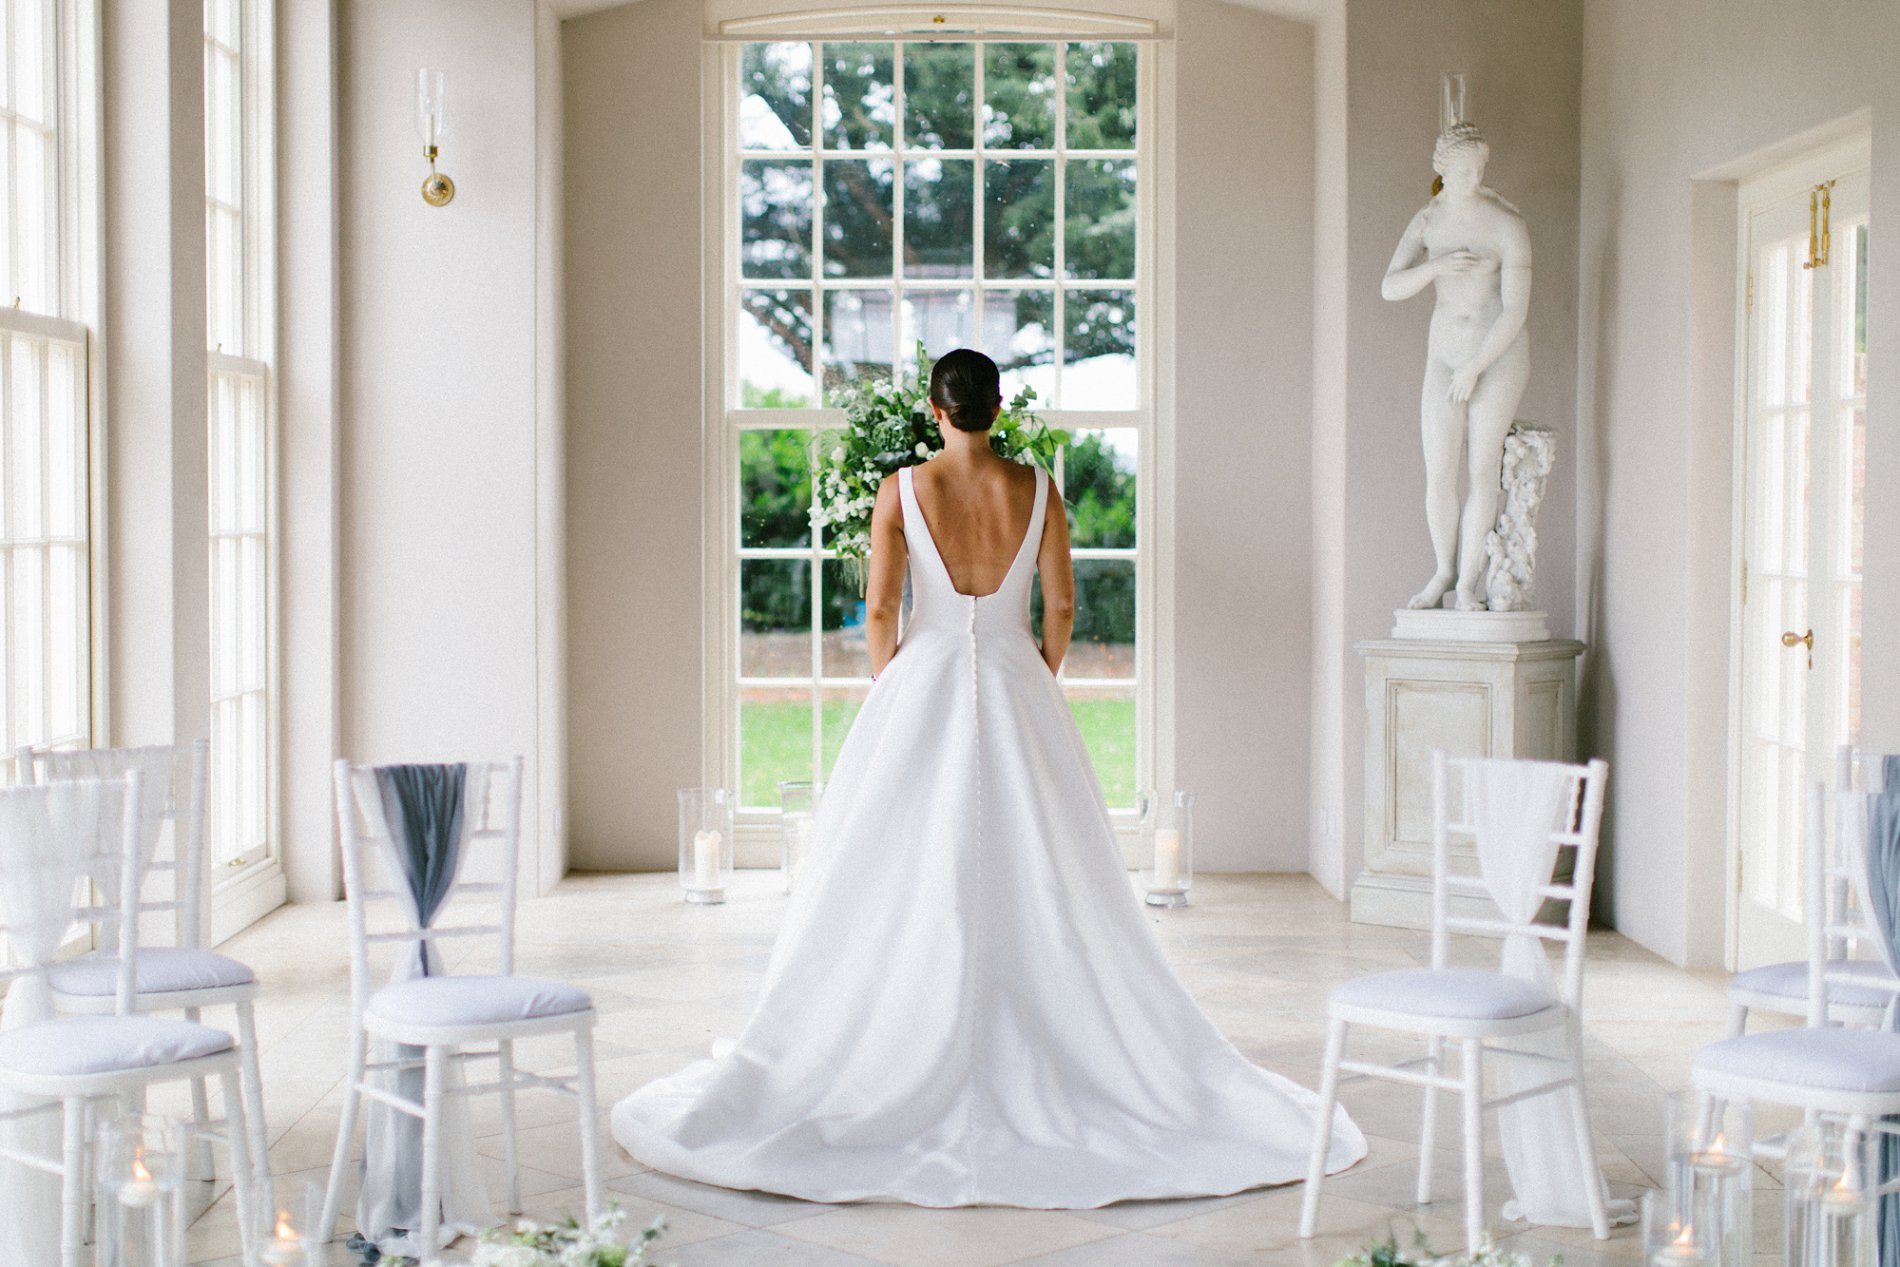 An Intimate Fine Art Wedding Shoot at Newby Hall (c) Melissa Beattie Photography (2)